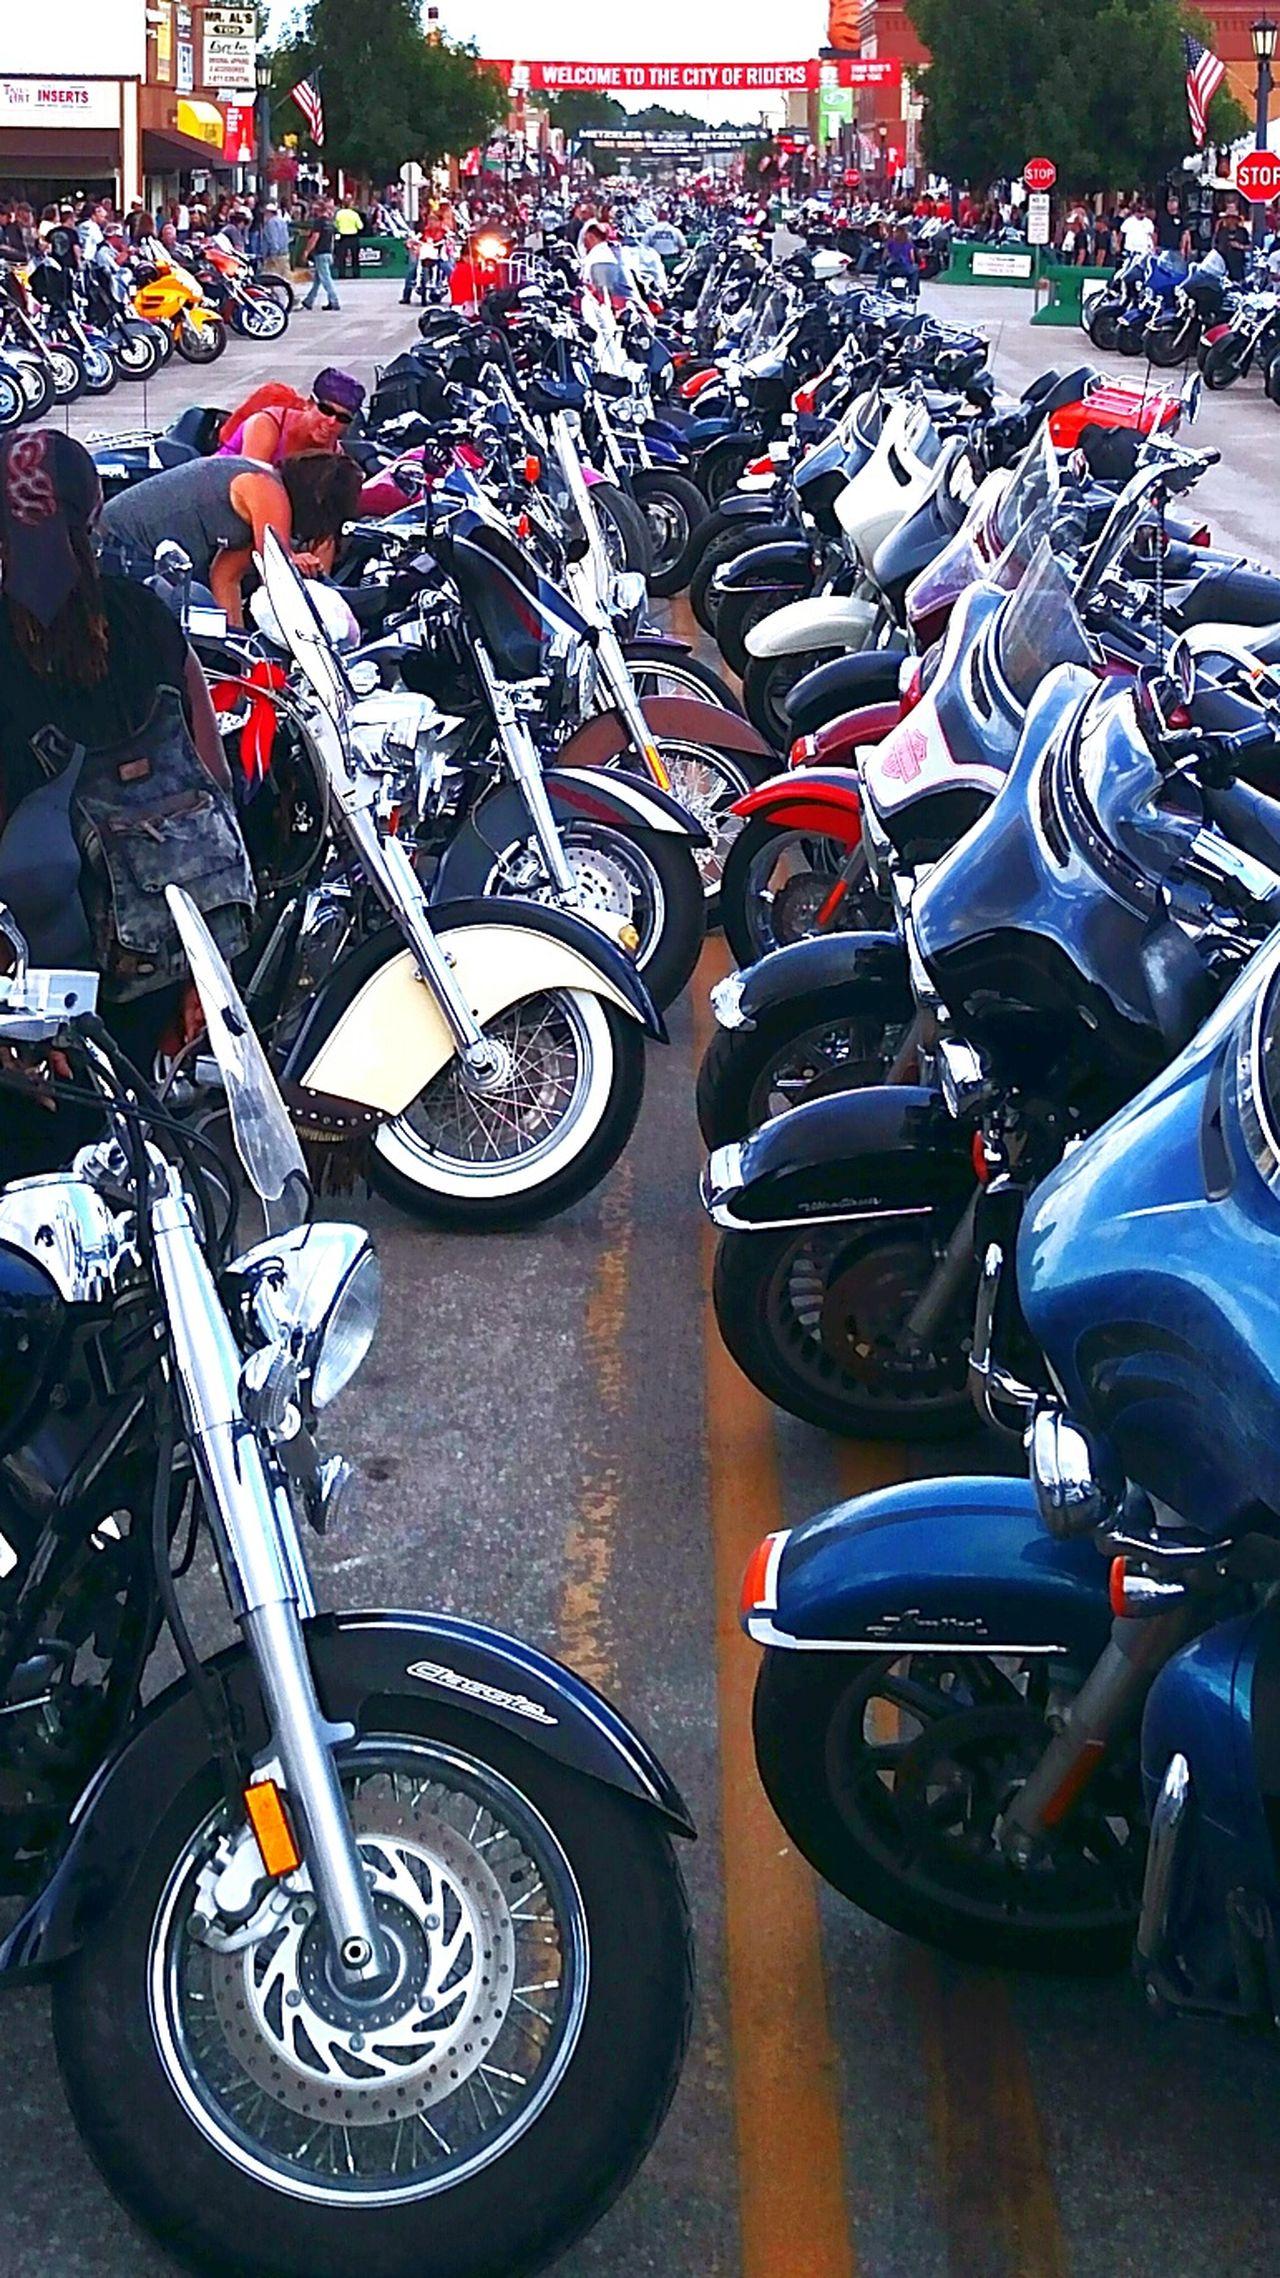 My Favorite Place Bikerlife First Eyeem Photo